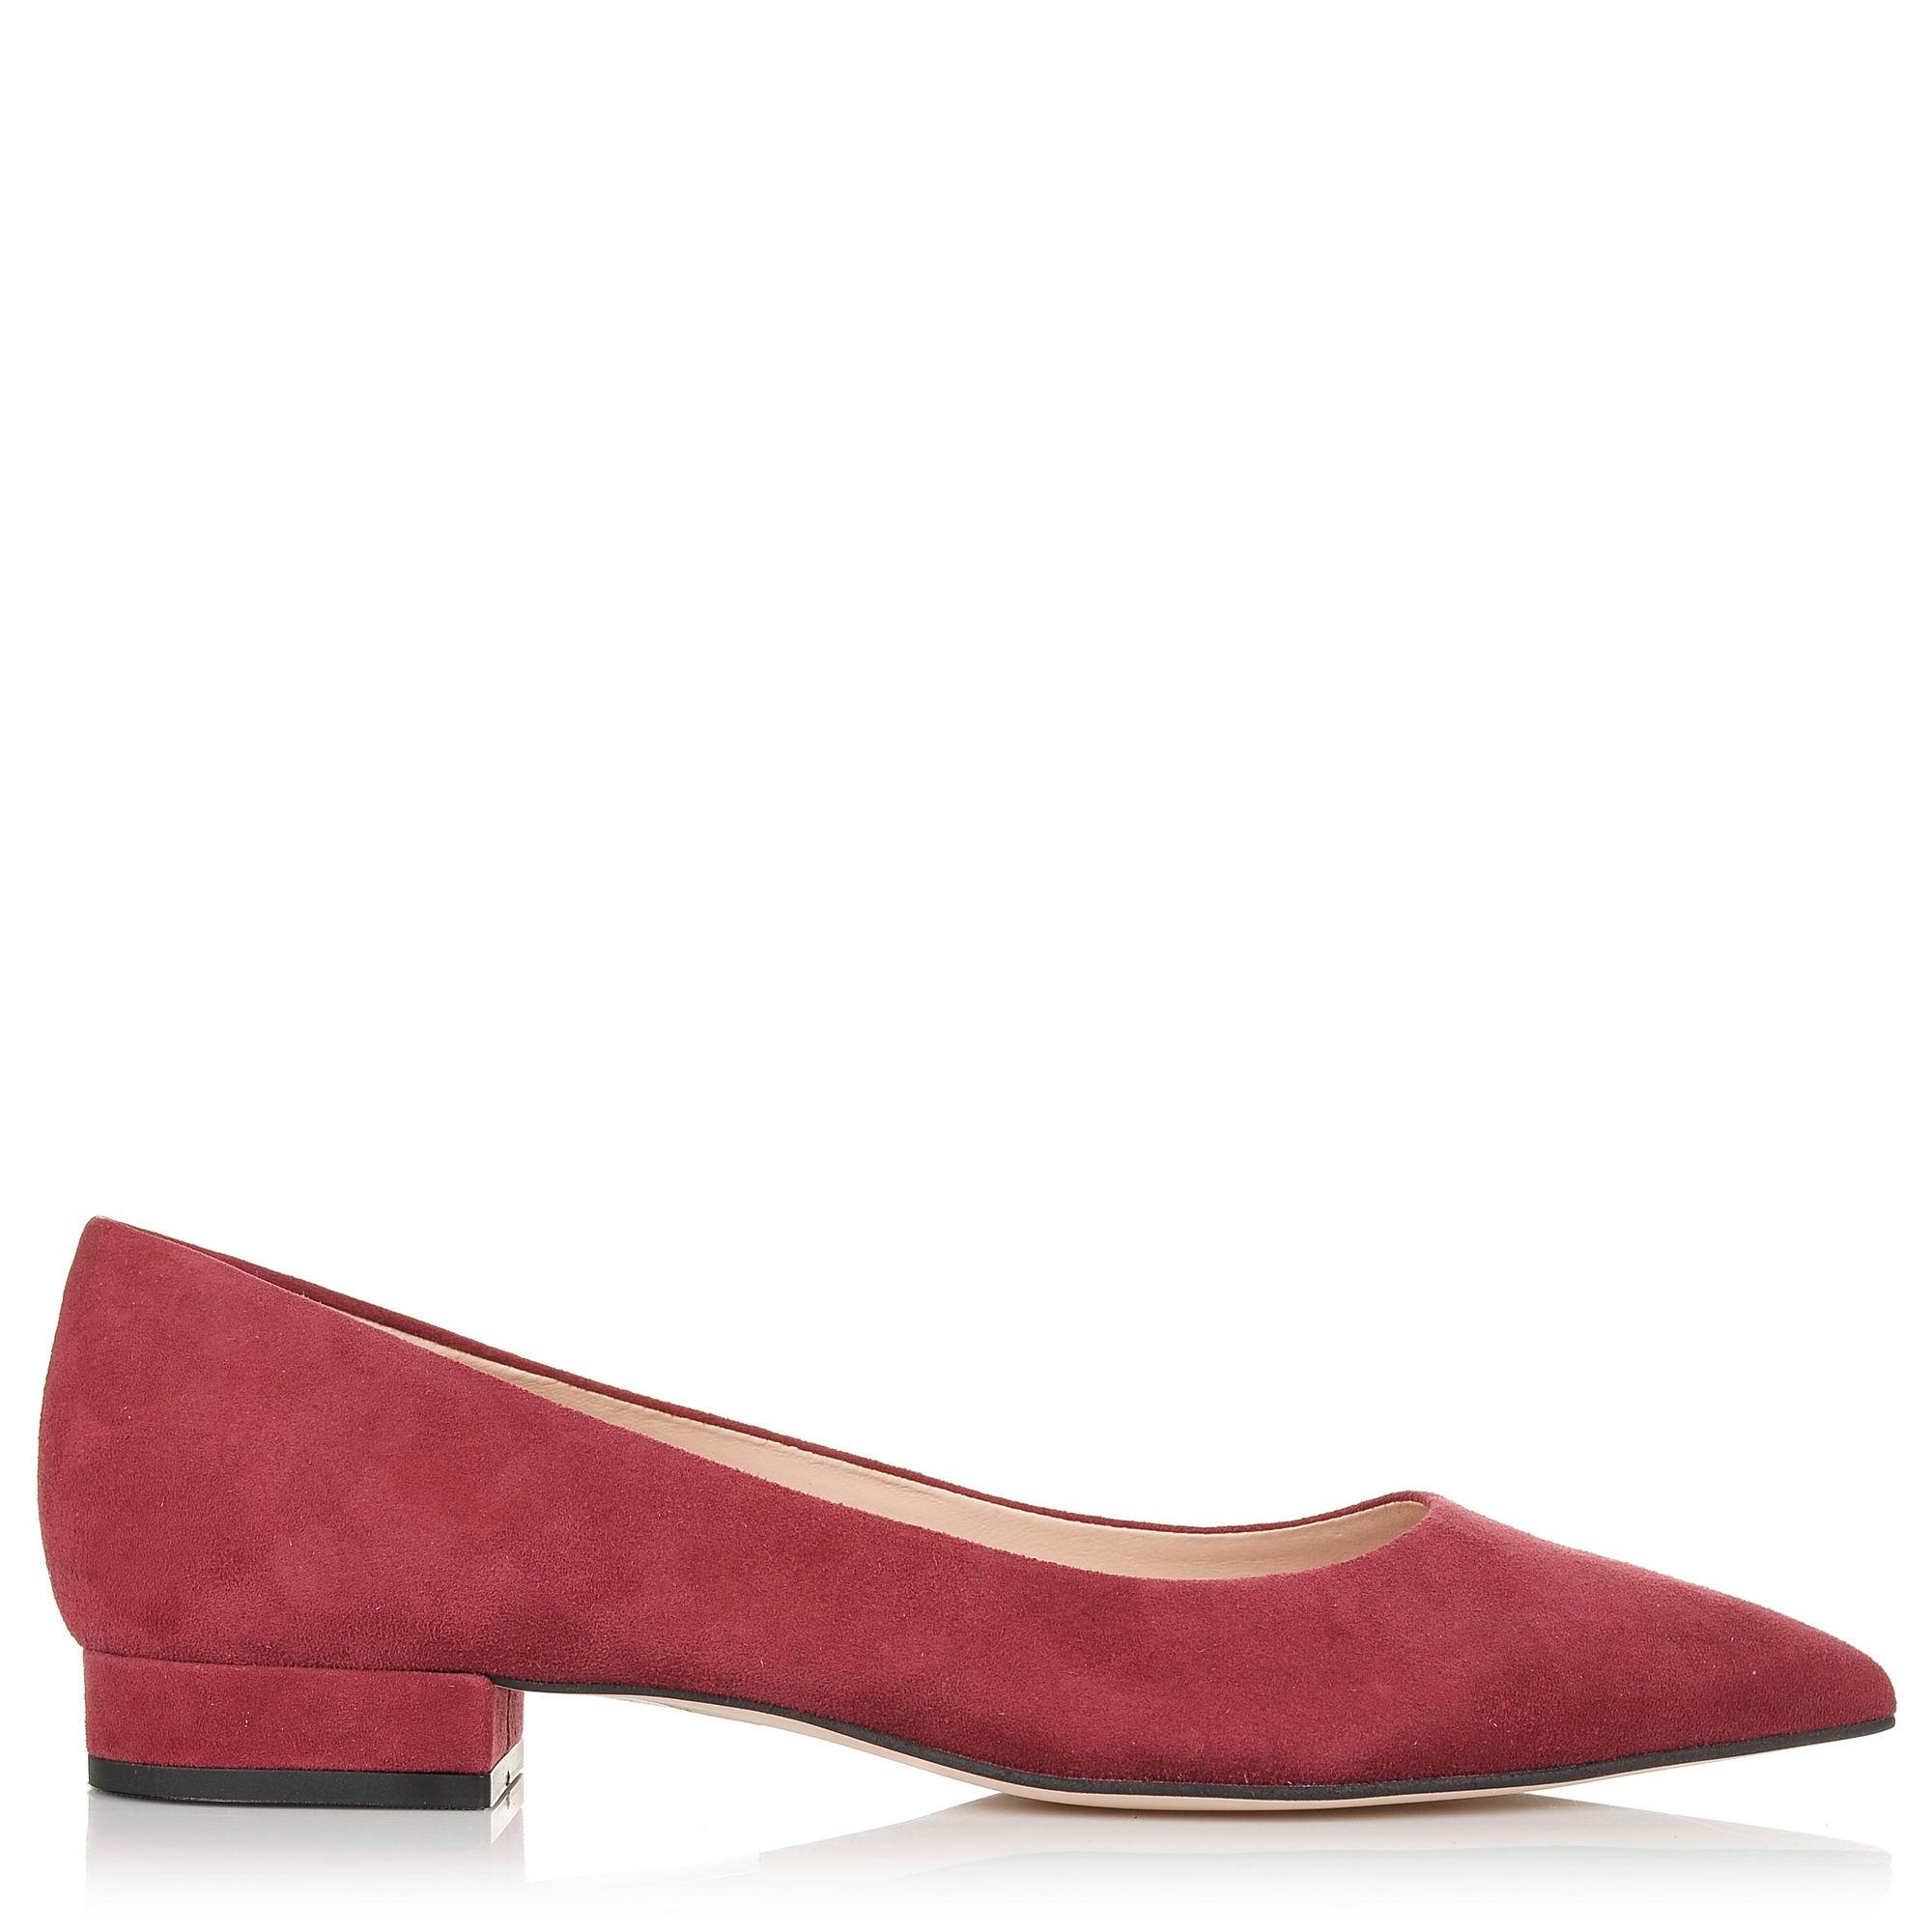 Suede Δερμάτινες Γόβες Mourtzi 1/12800 γυναικα   γυναικείο παπούτσι